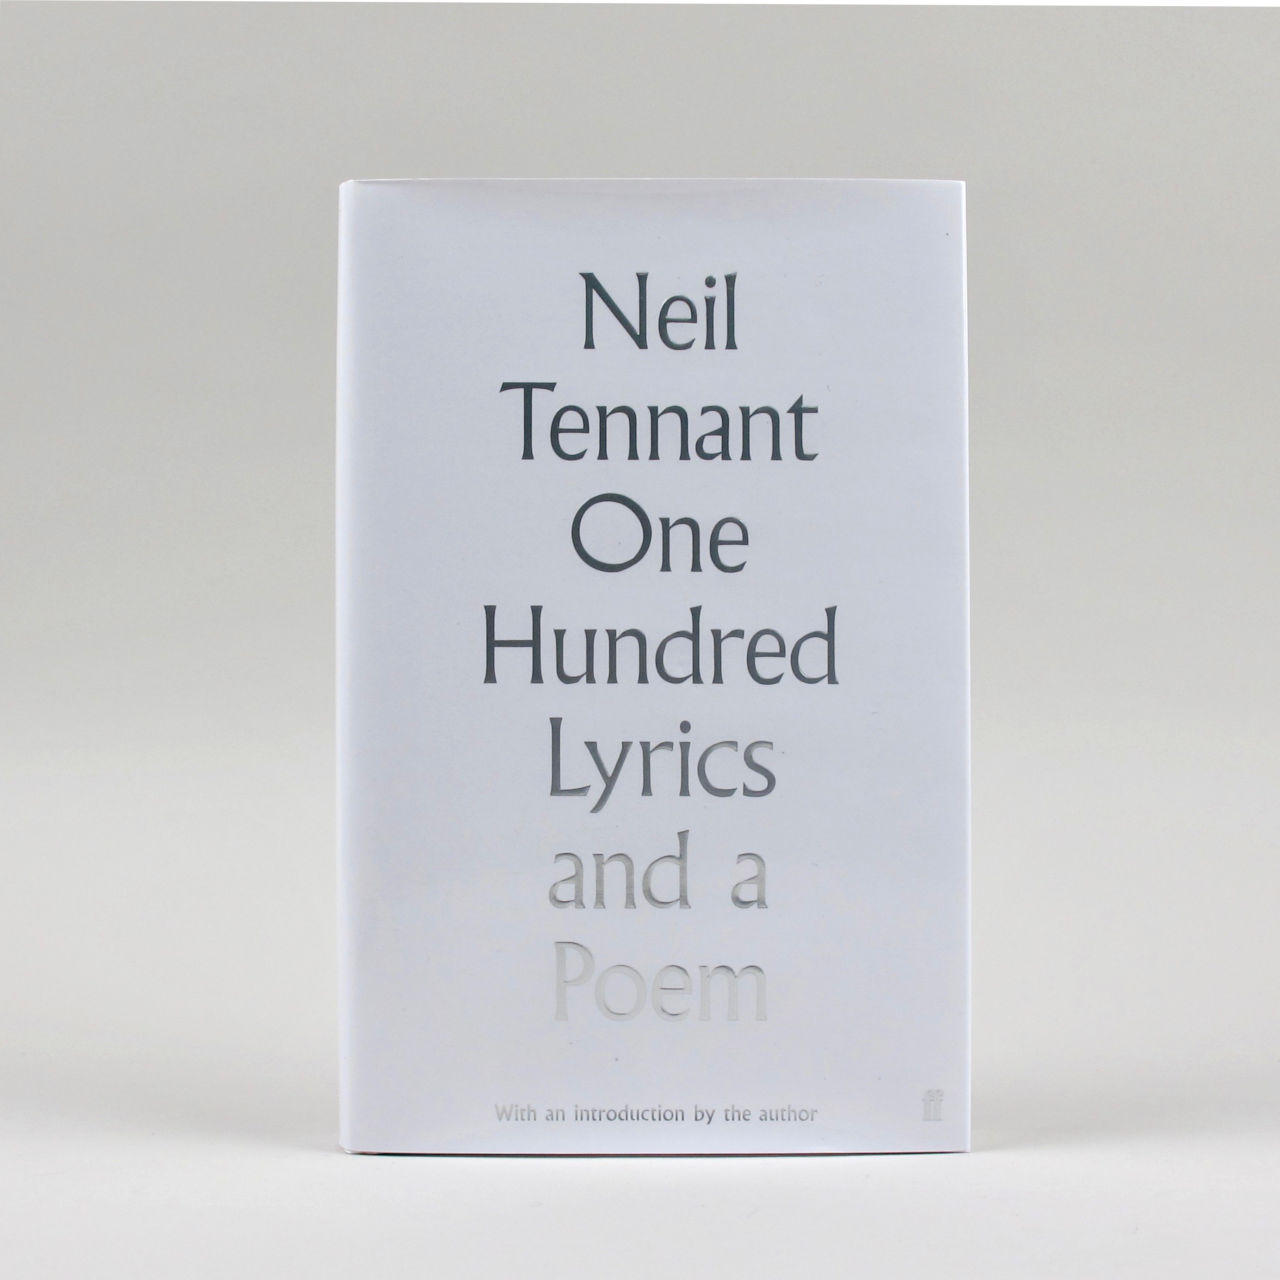 One Hundred Lyrics and a Poem - Neil Tennant